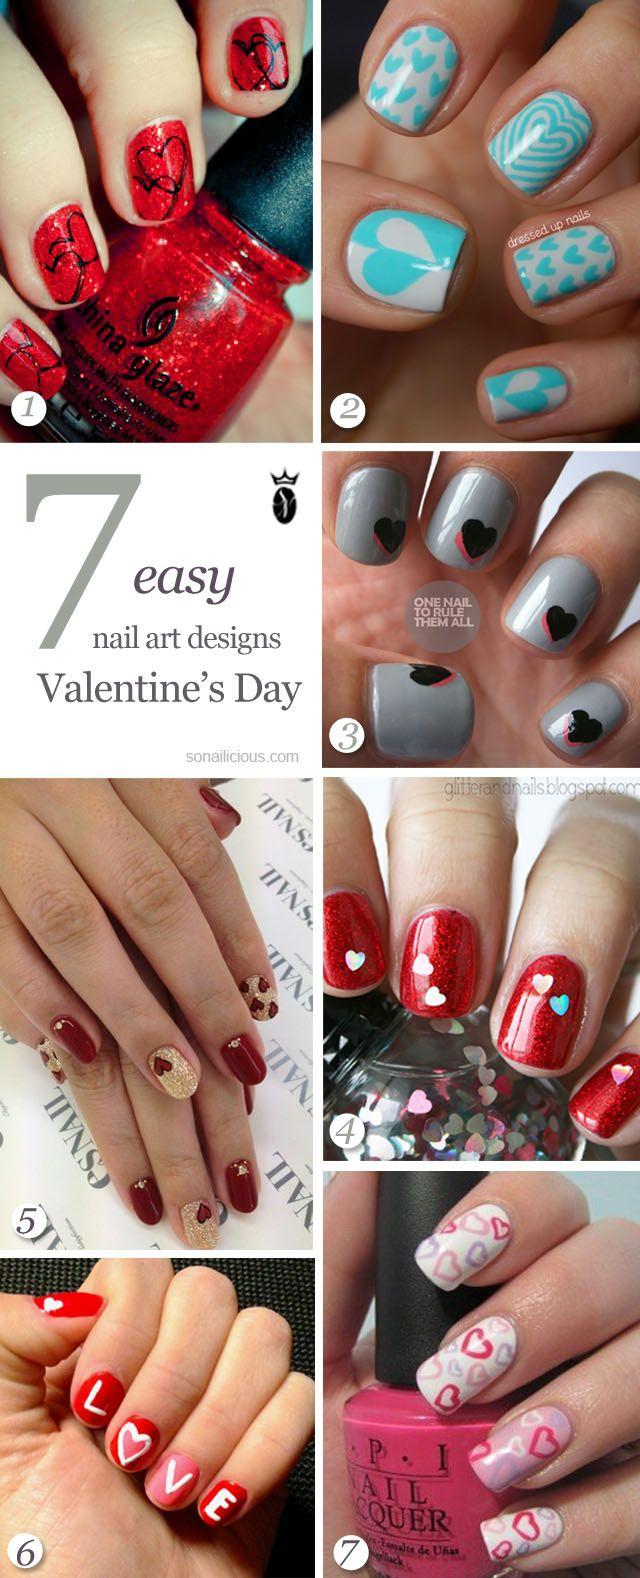 Valentine\'s Day nails: 7 easy nail designs | Easy, Nail nail and Makeup